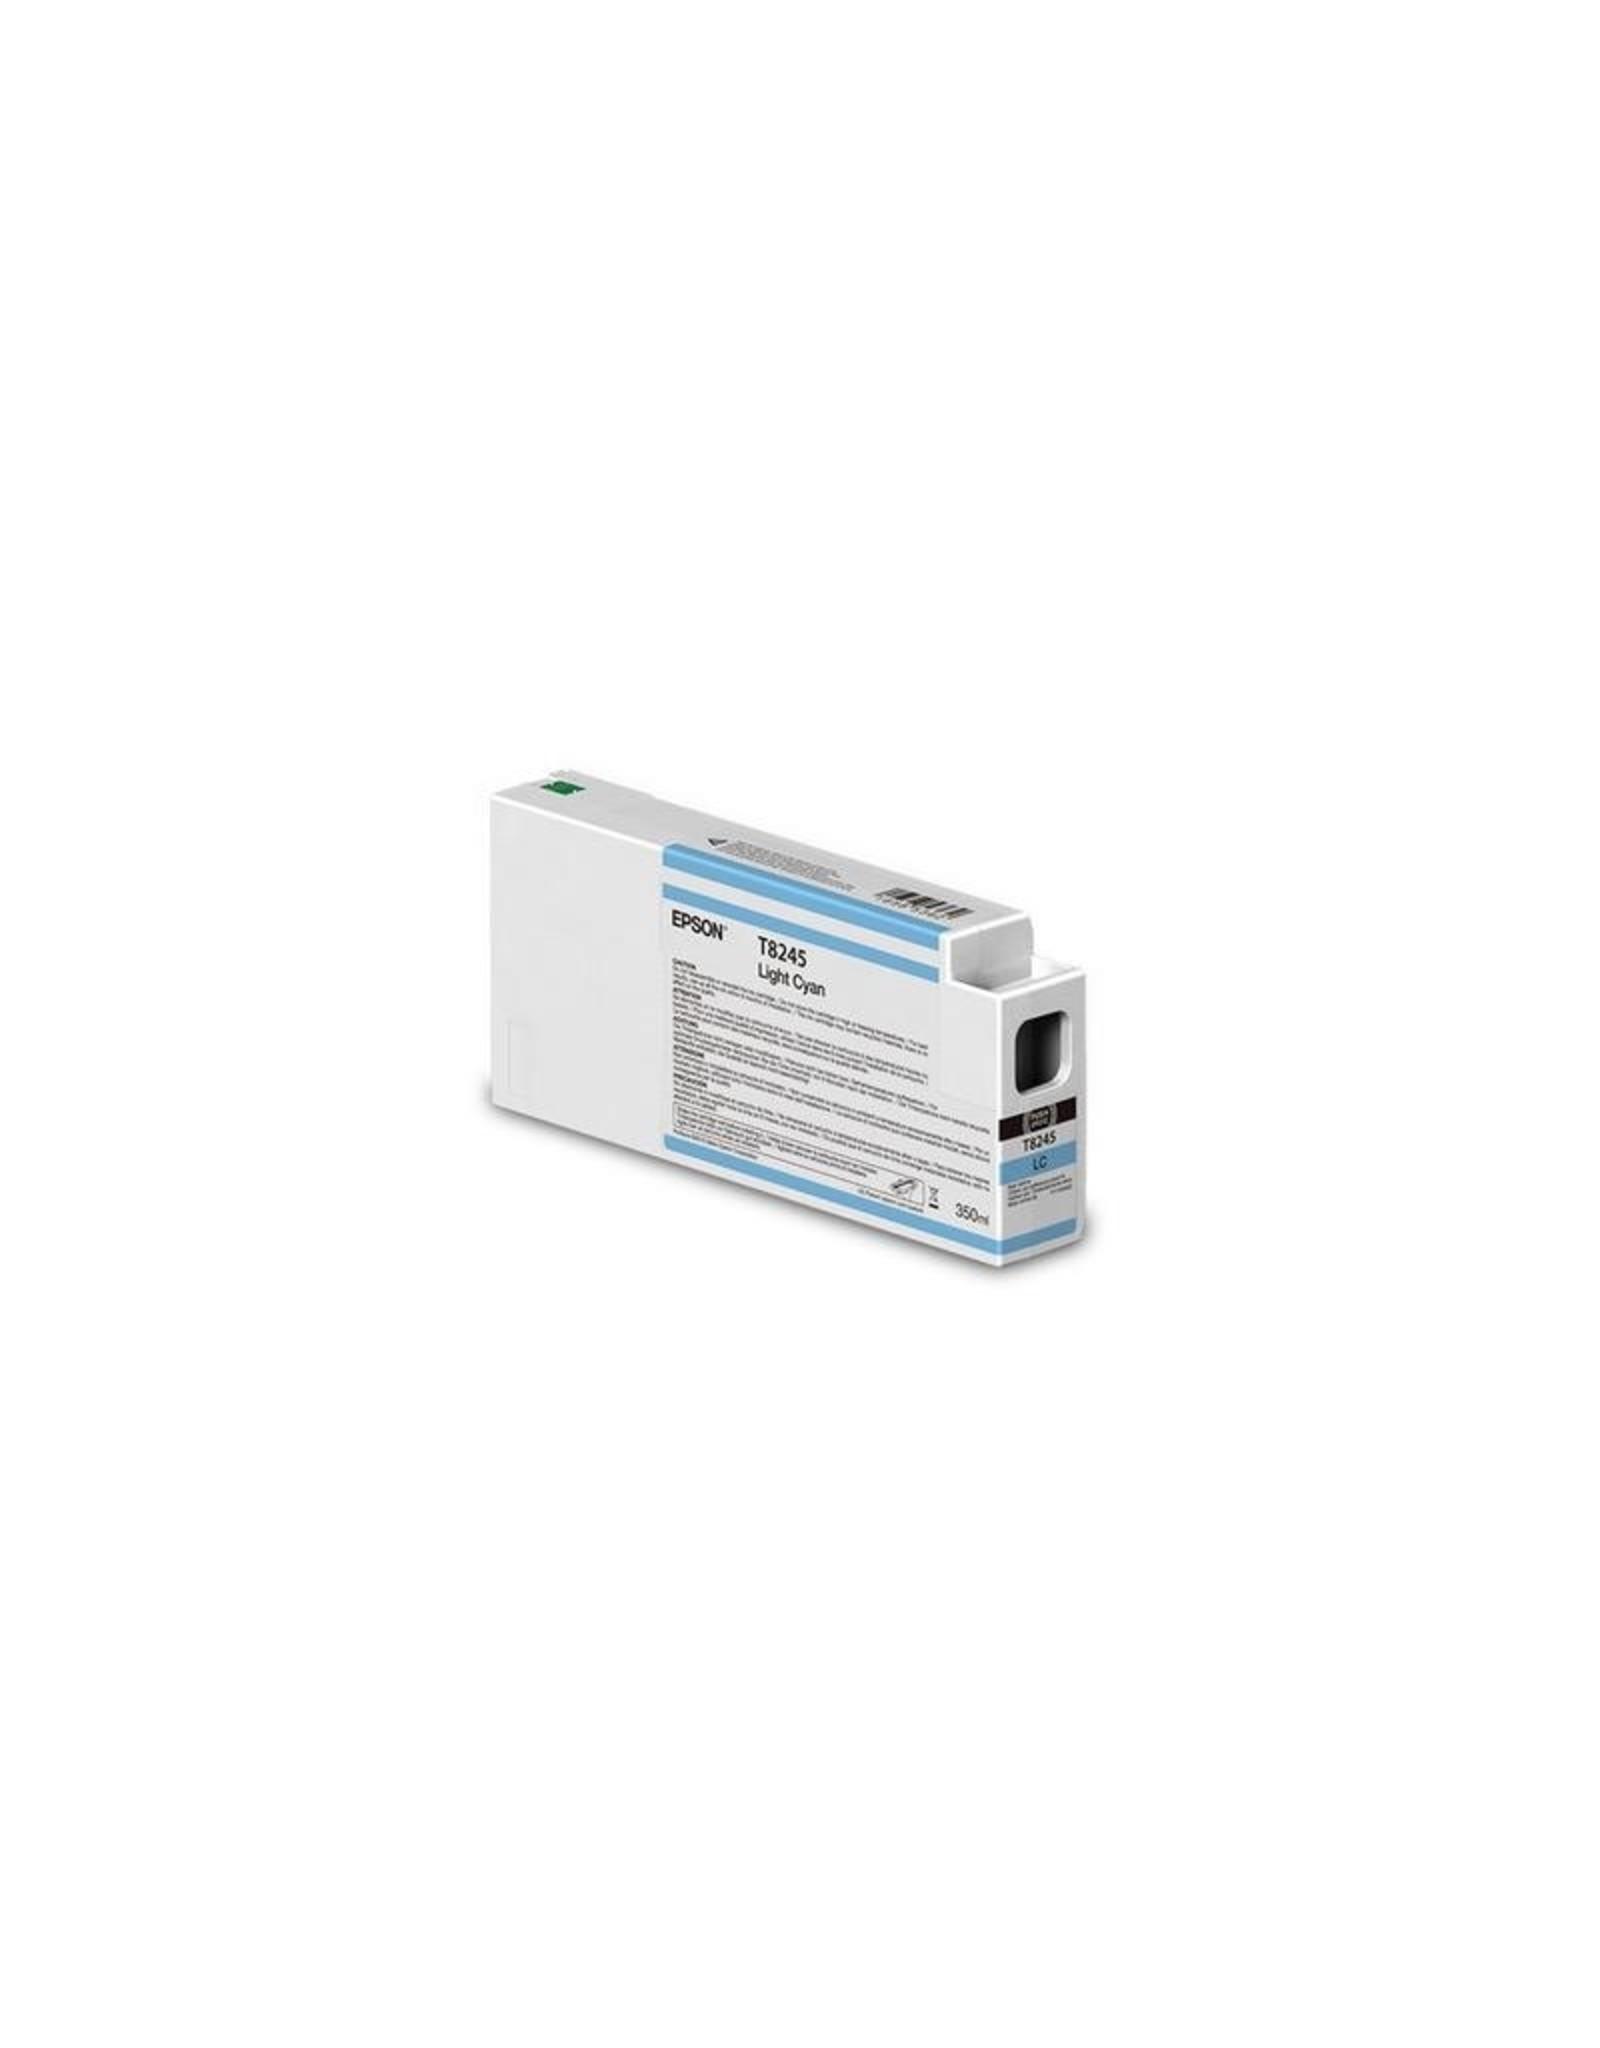 Epson Epson Ultrachrome HD Light Cyan Ink 350ML for SC-P7000/9000